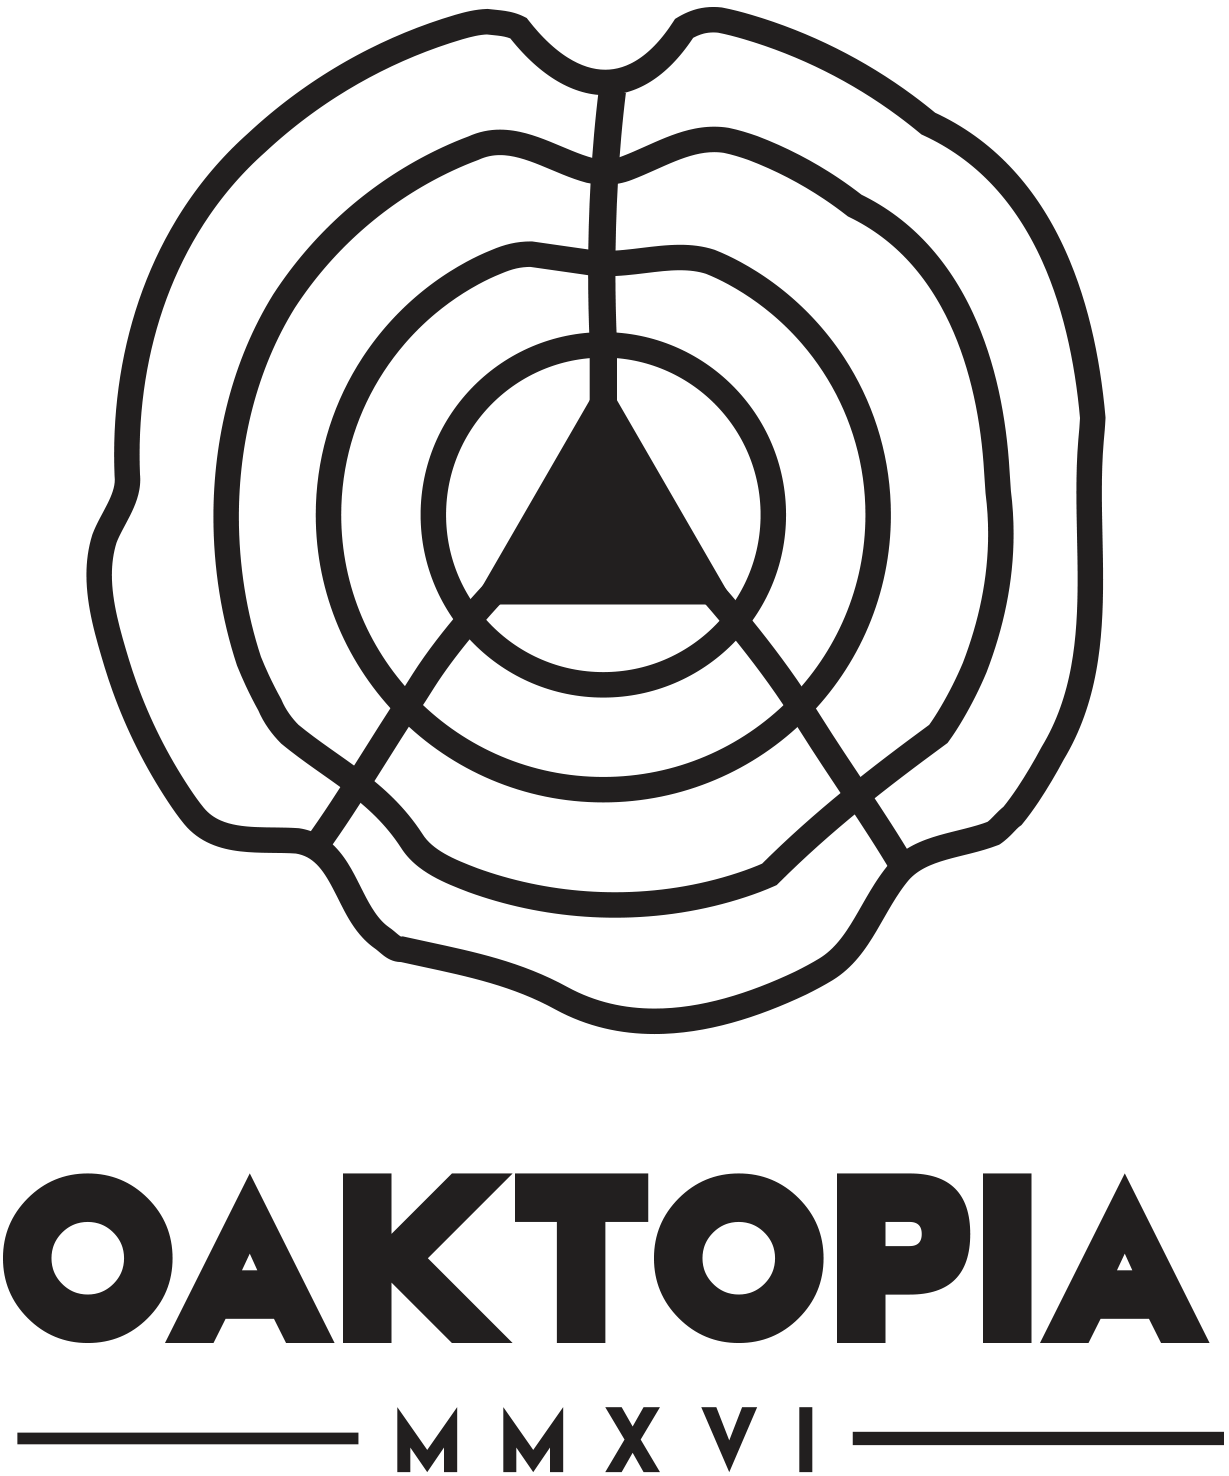 Oaktopia Music and Arts Festival